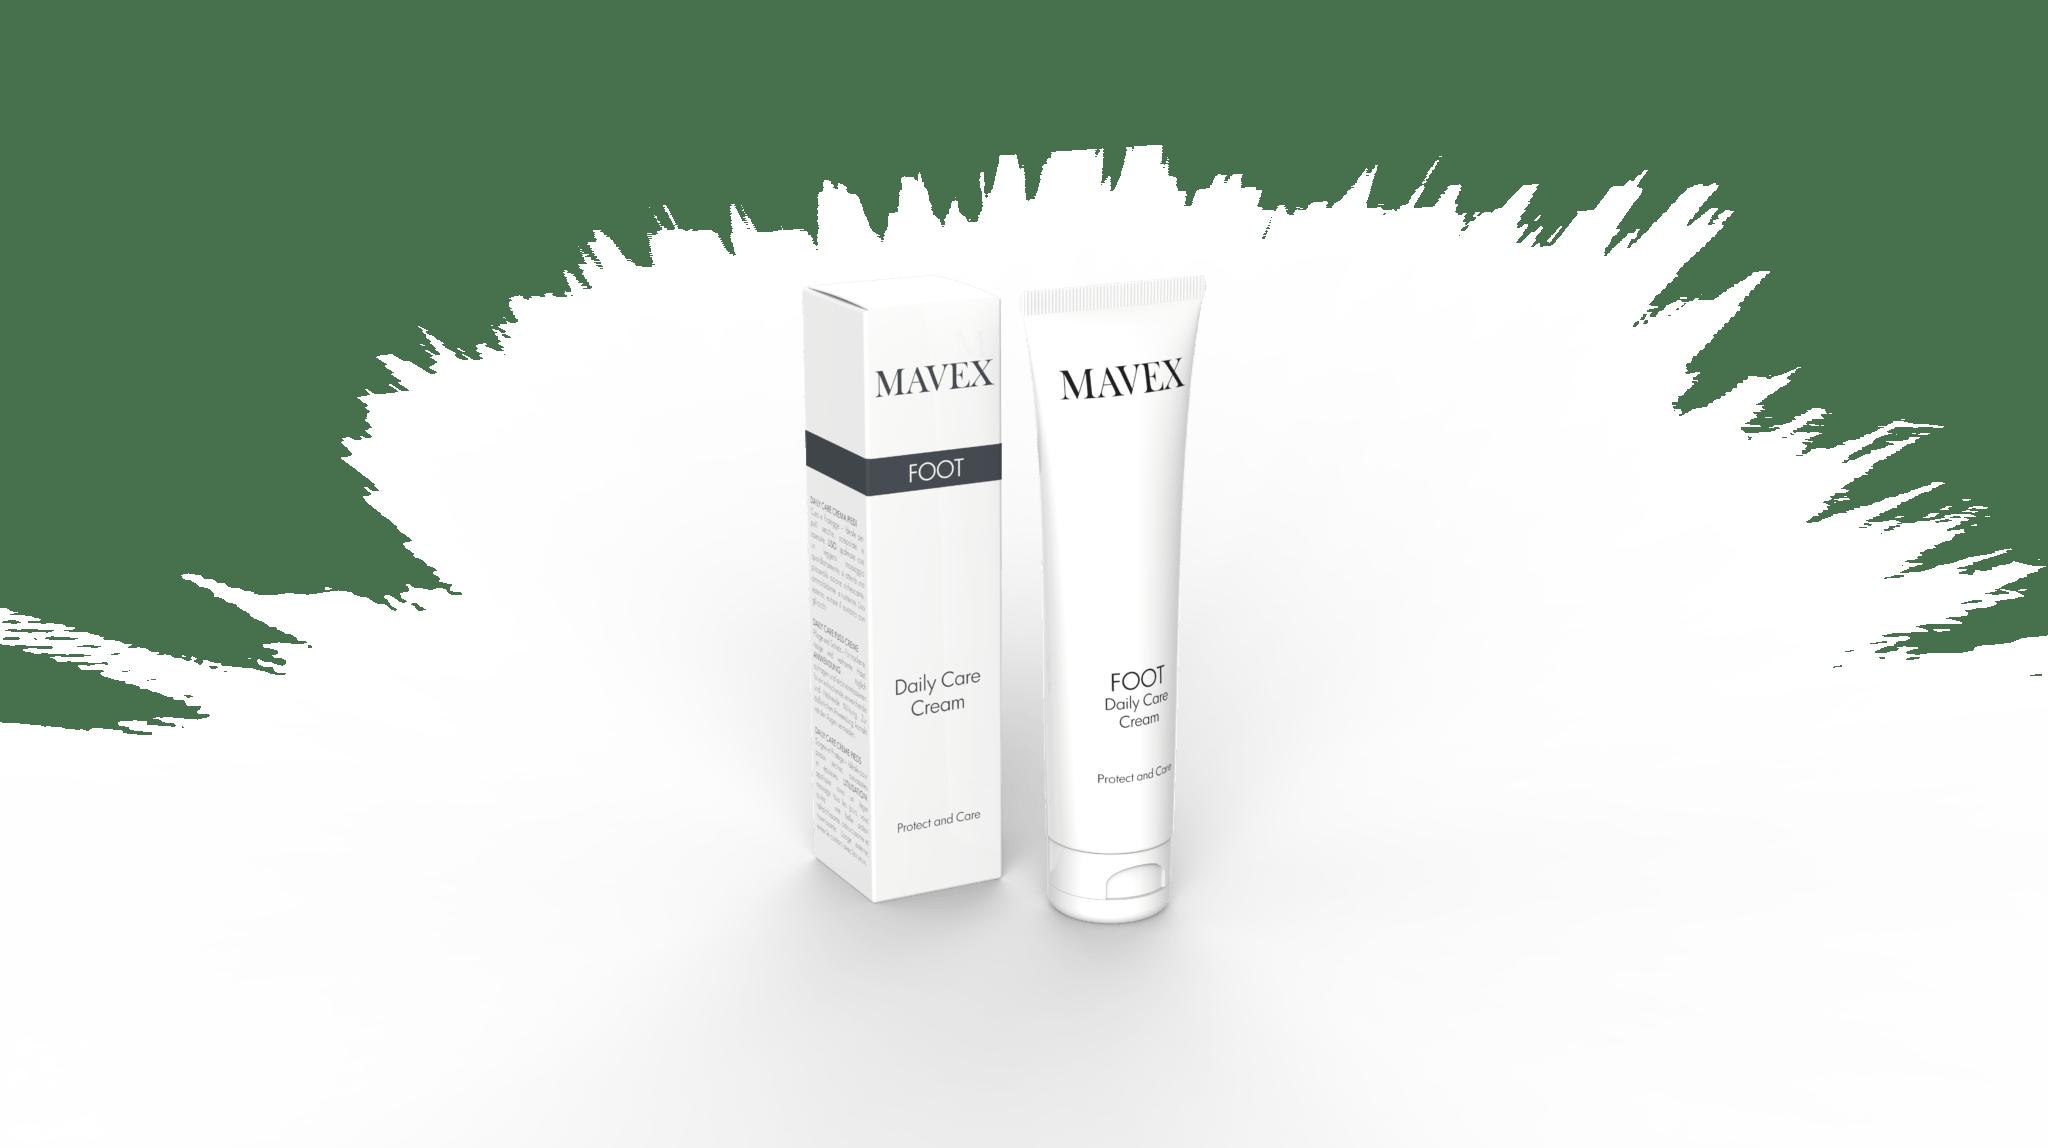 mavex foot daily cream